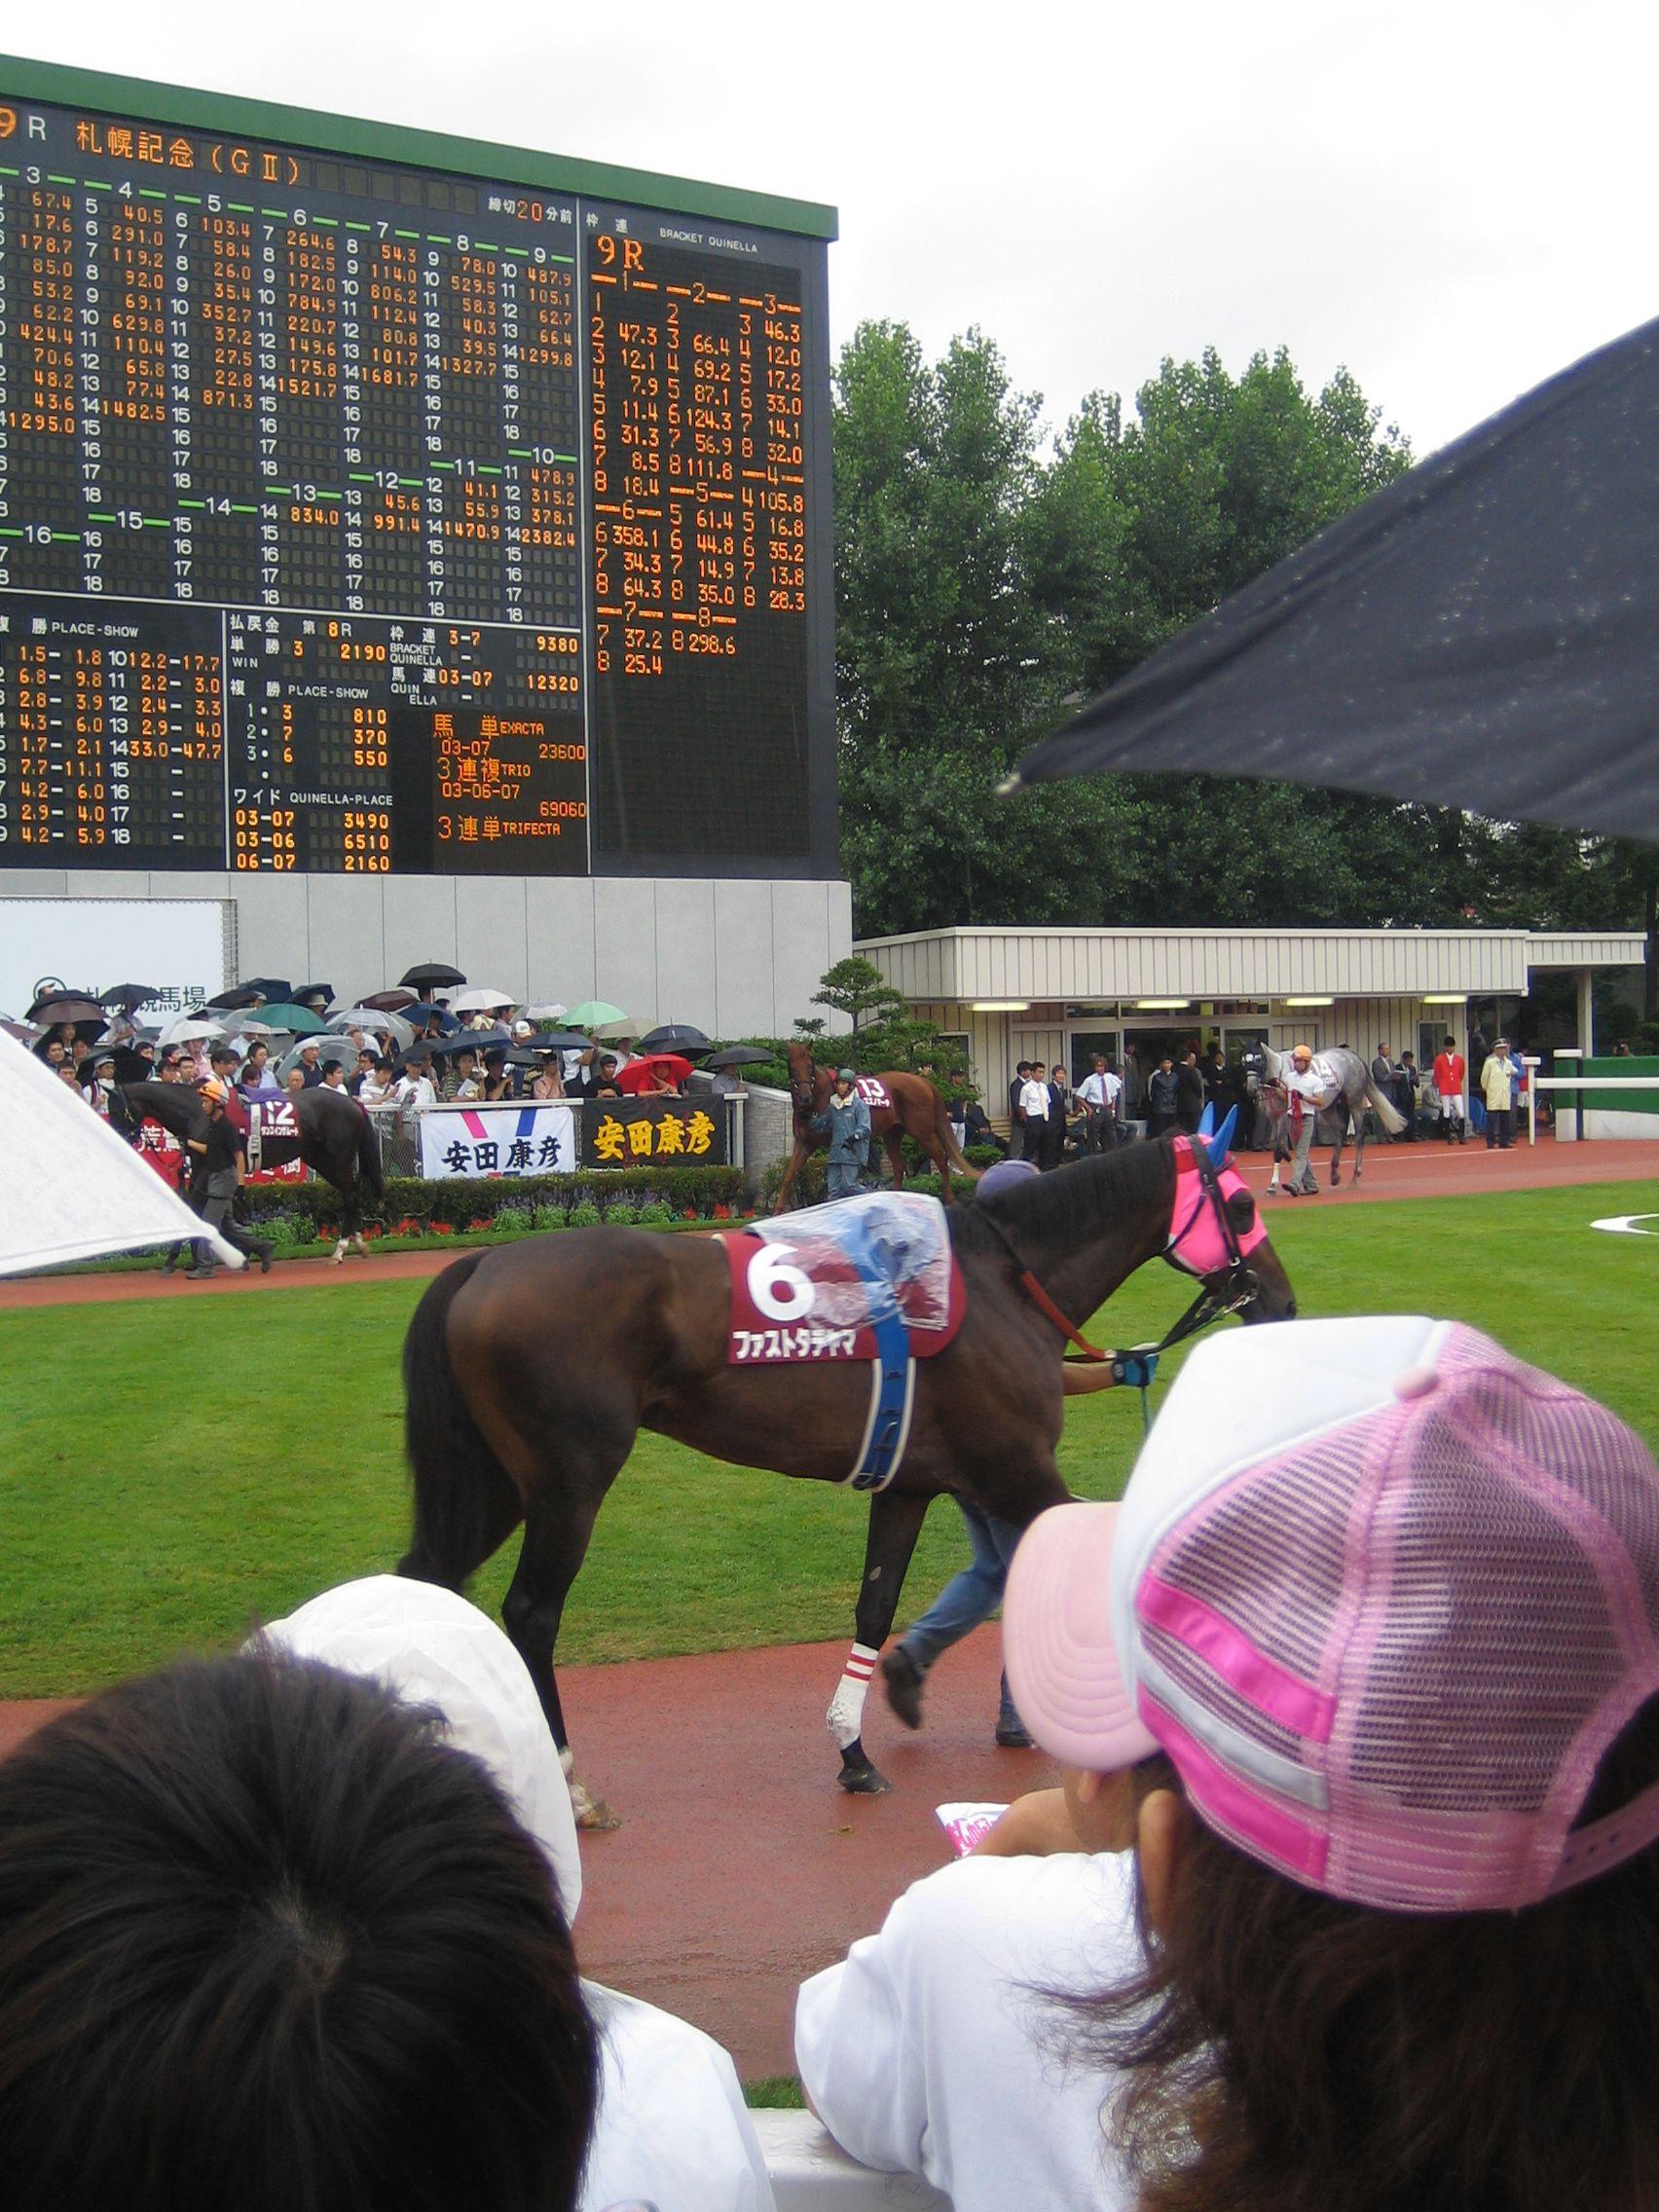 File:安田康彦 (36778153).jpg - Wikimedia Commons